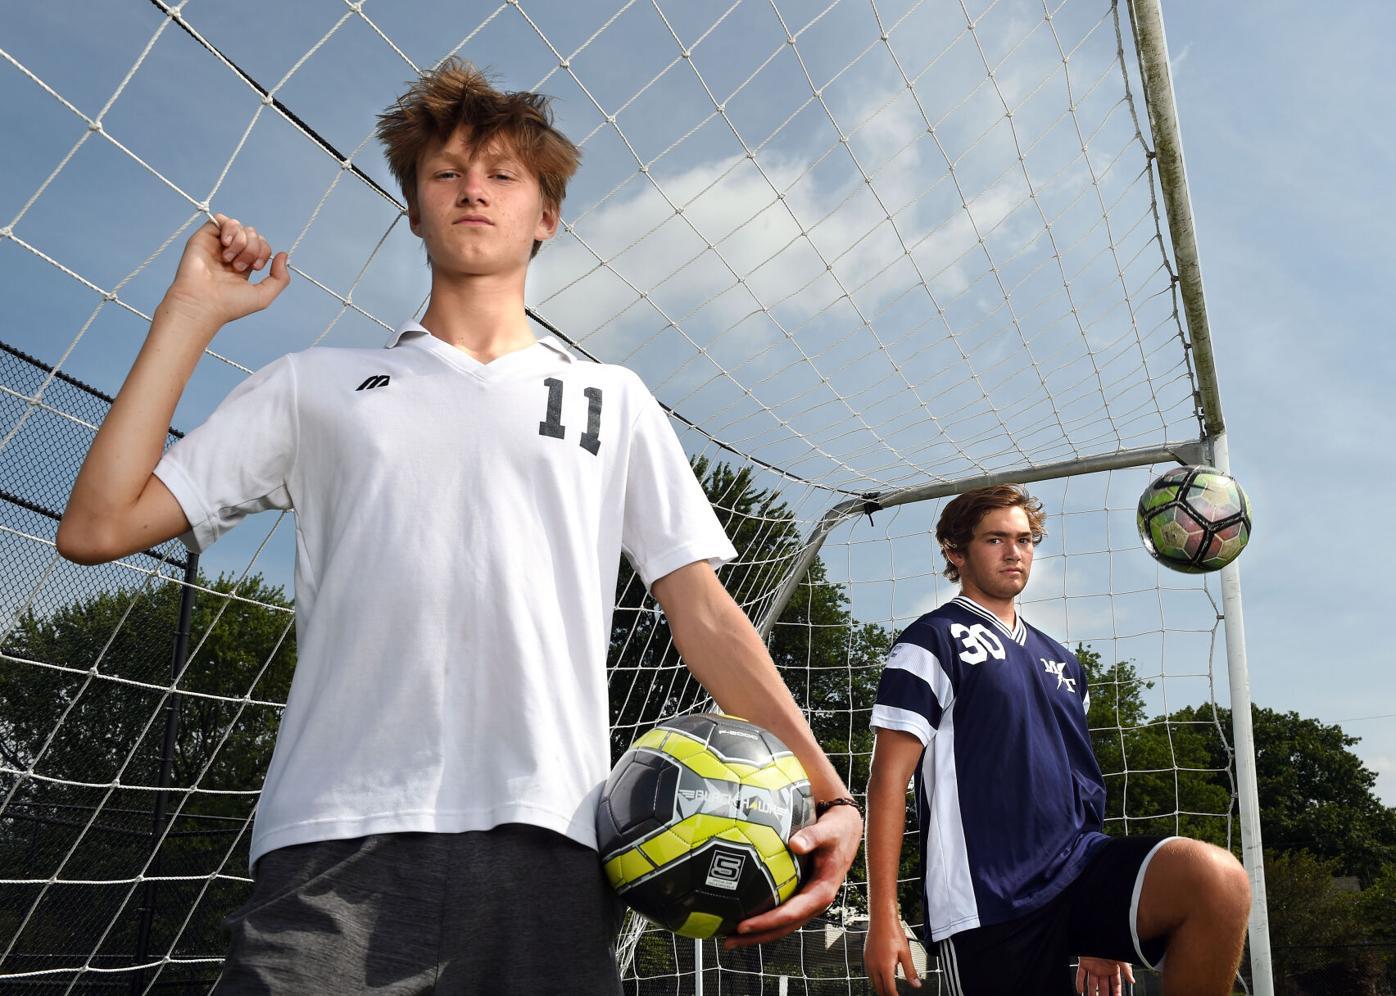 Moses Beers and Shane Mundorf-Manheim Twp. Boys Soccer